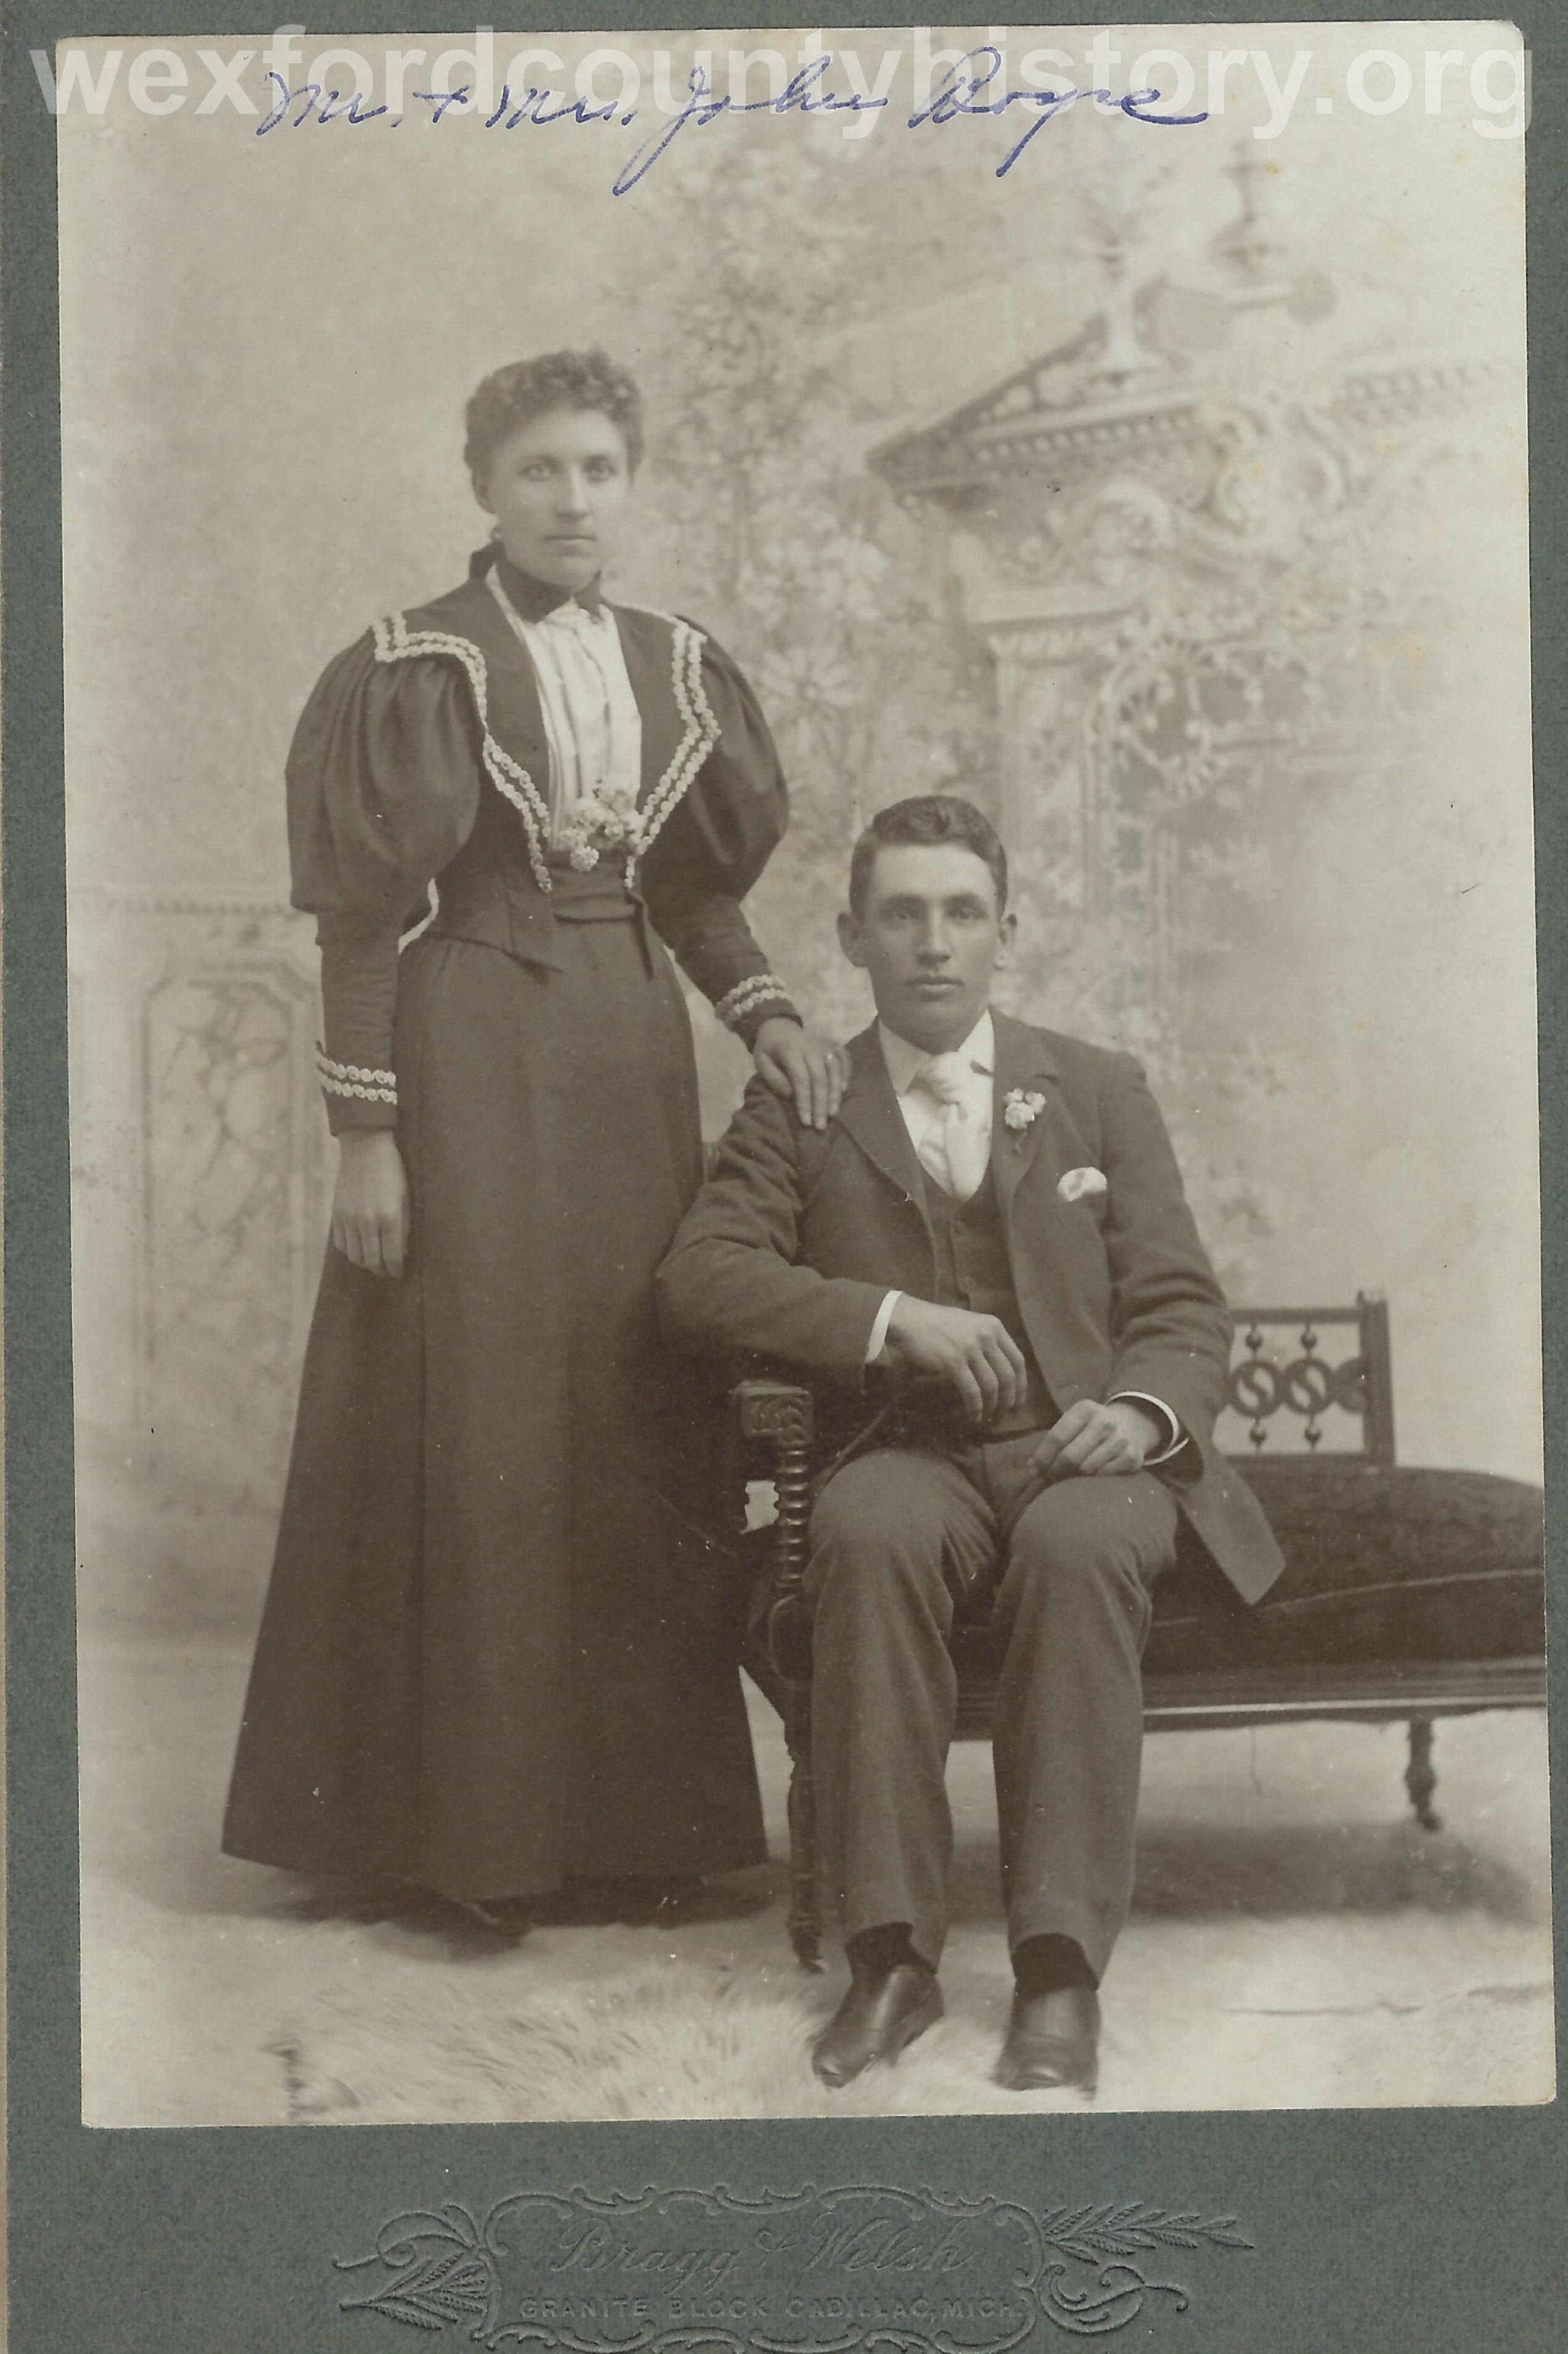 Mr. And Mrs. Boyne